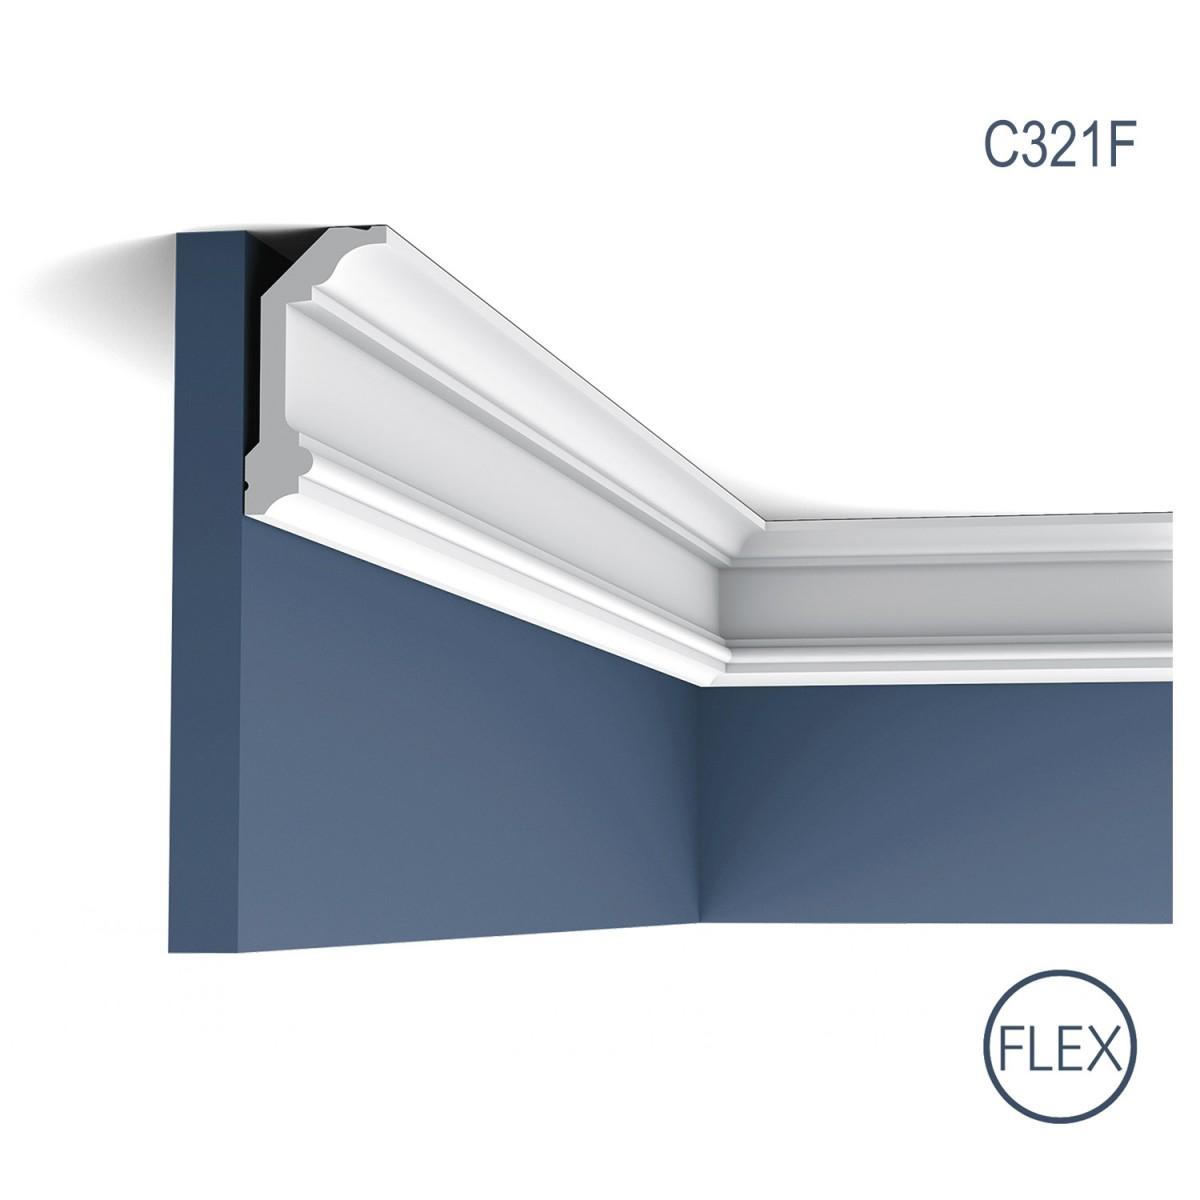 Cornisa Flex Luxxus C321F, Dimensiuni: 200 X 9.9 X 5 cm, Orac Decor